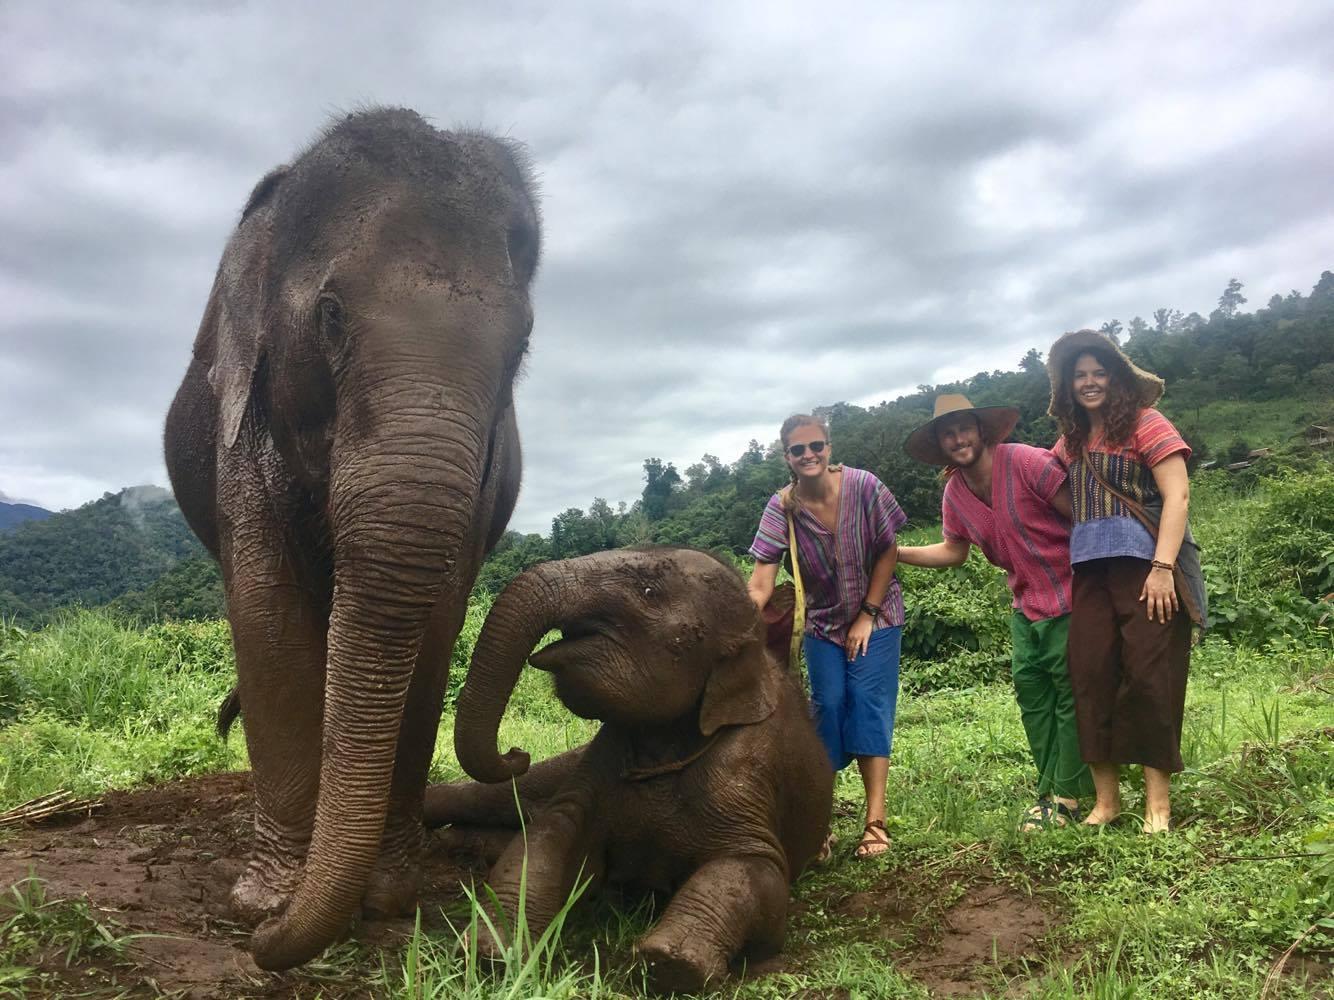 Tourist having a good time with the elephants.jpg